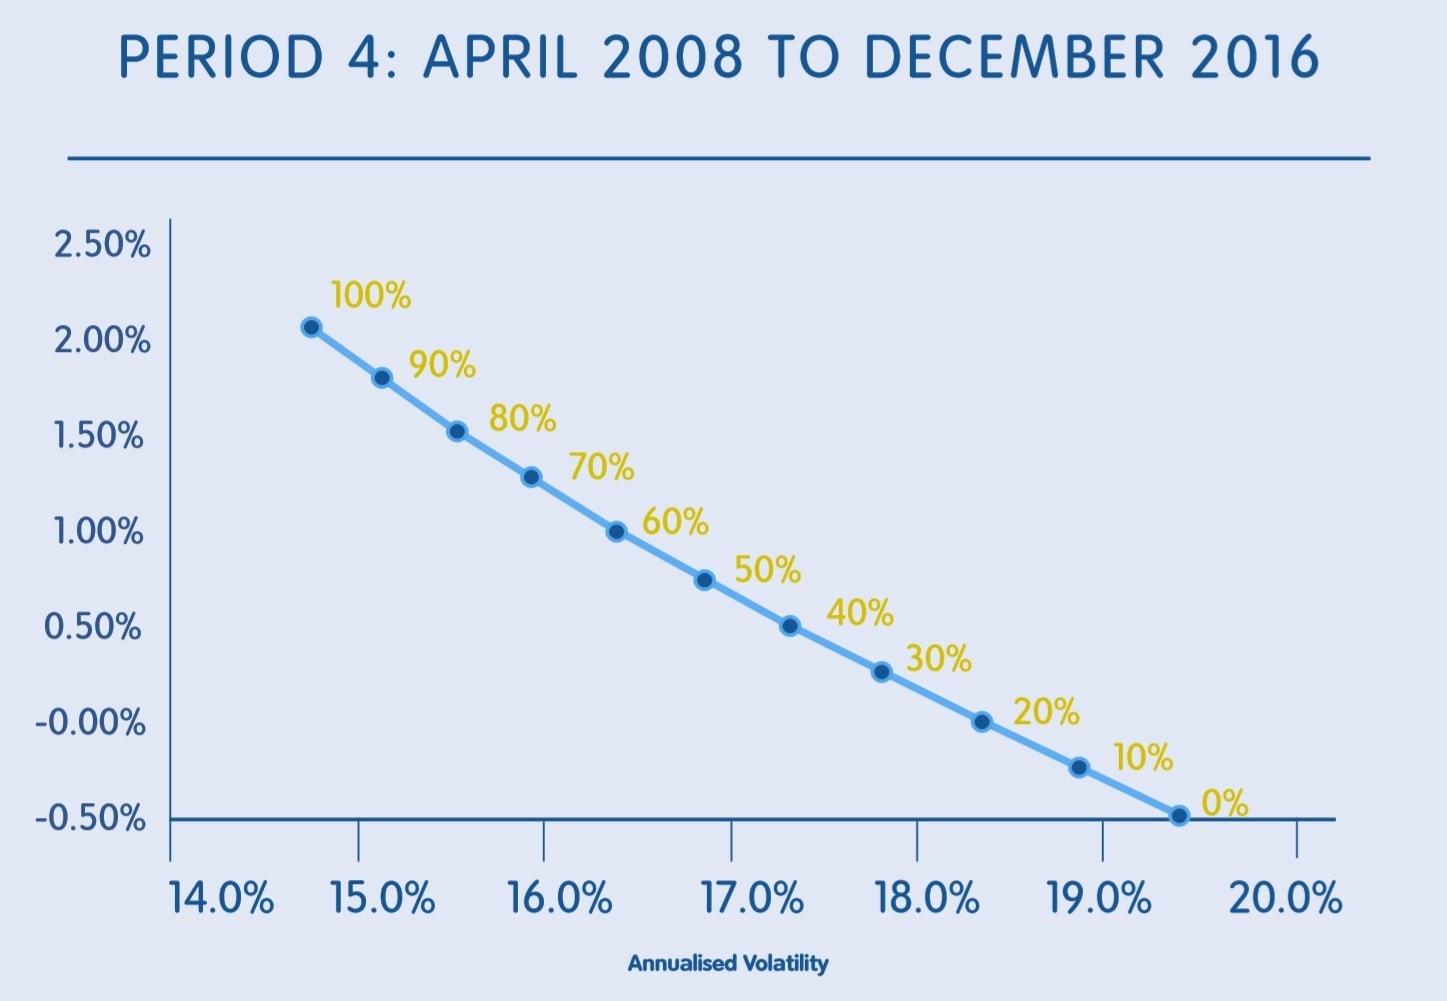 period 4 april 2008 to december 2016